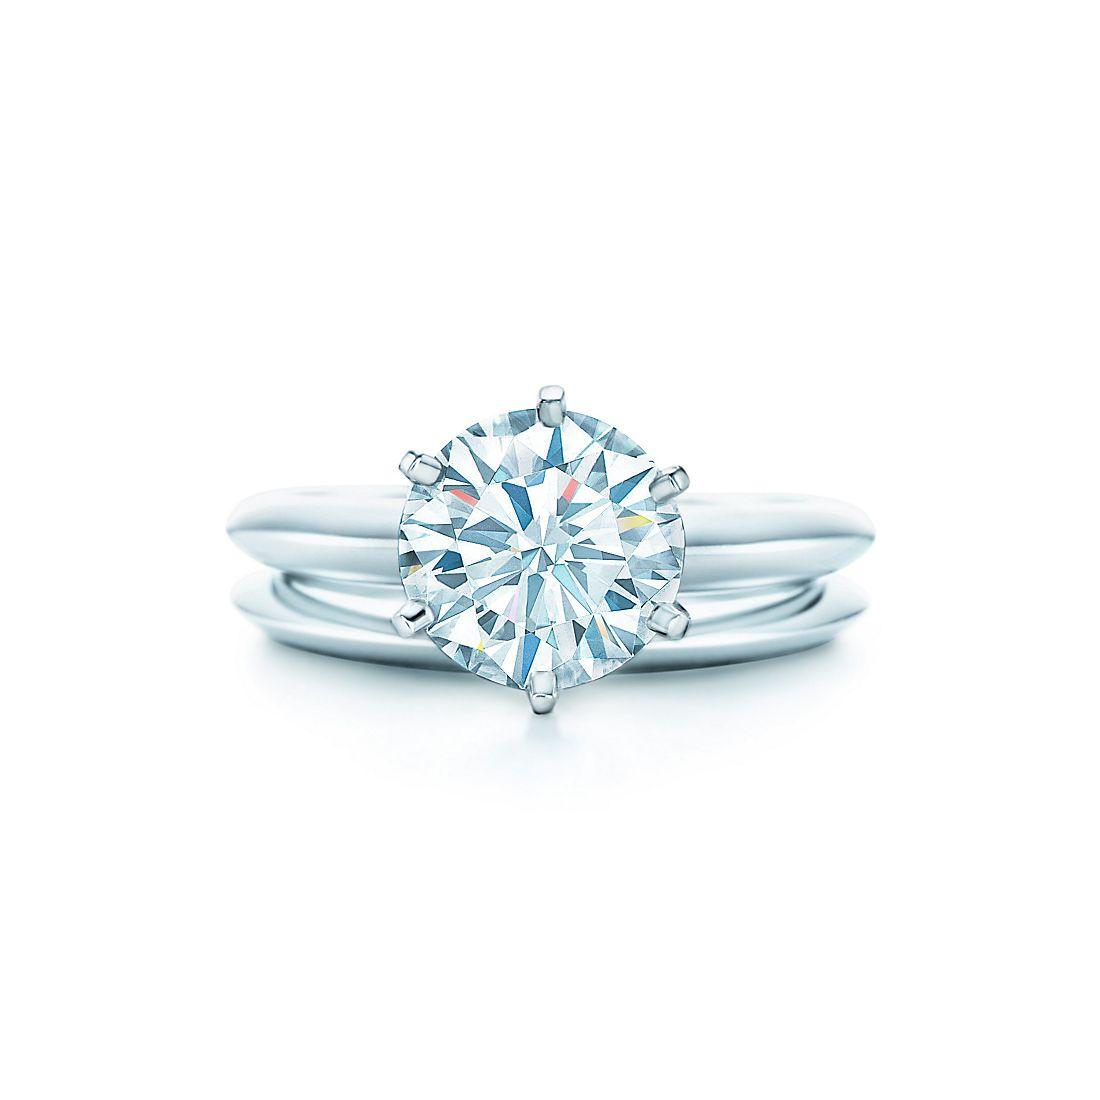 на фото  2,1 кар, второе кольцо — Обручальное кольцо Tiffany 8edd02eb3ca